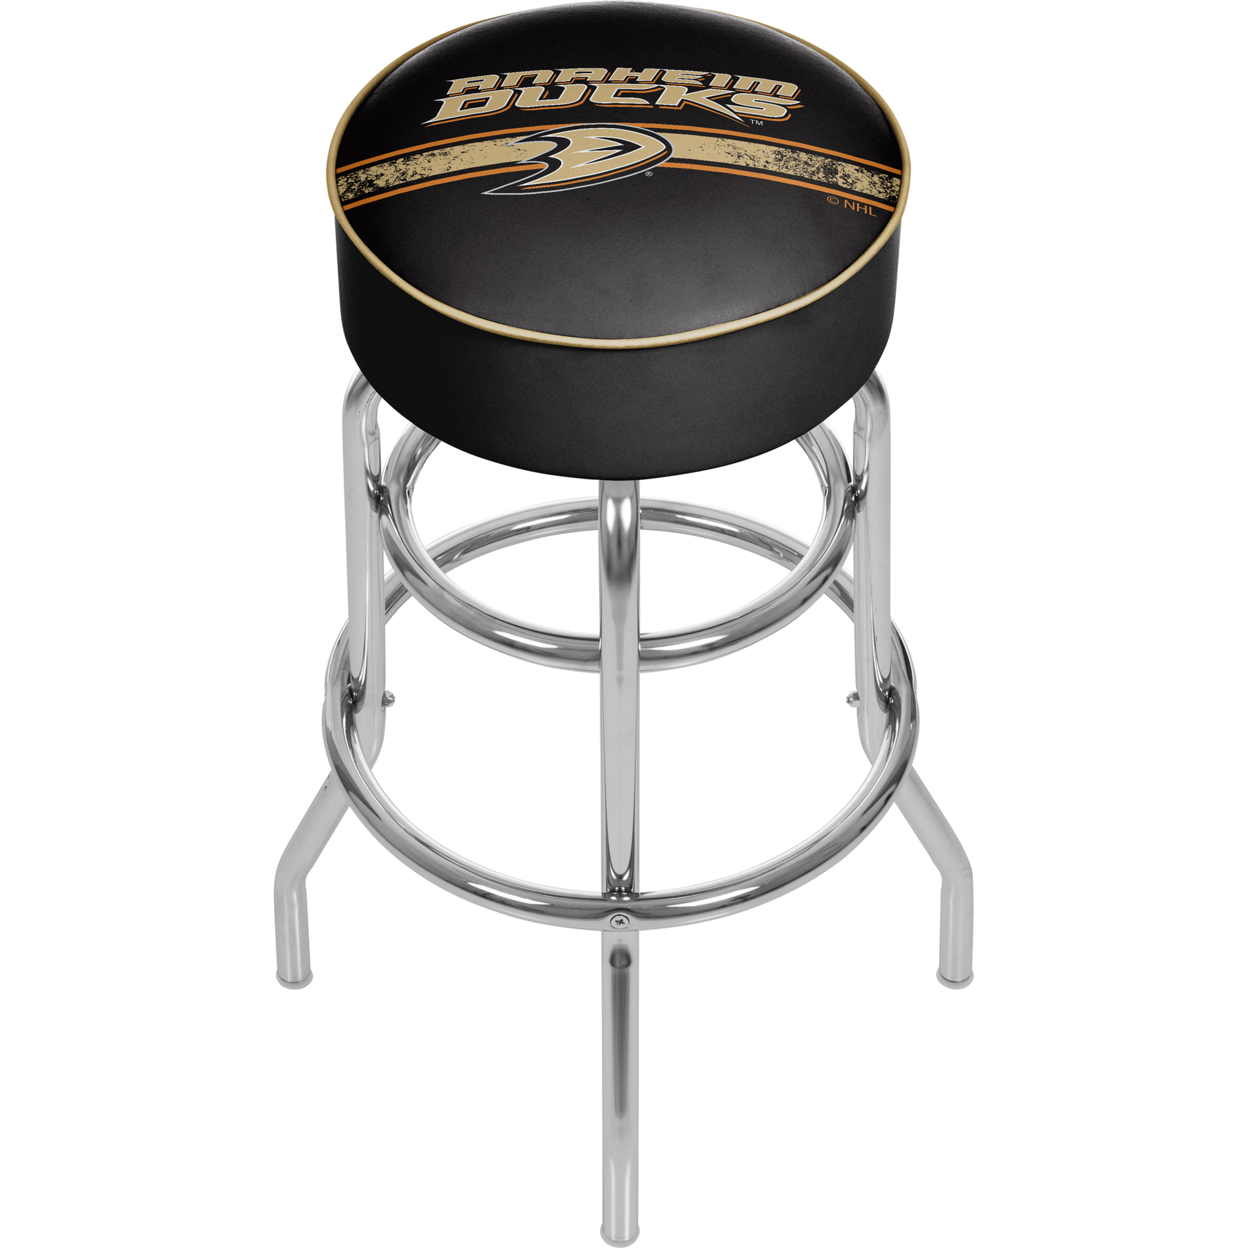 NHL Chrome 30 Inch Bar Stool with Swivel - Anaheim Ducks nhl chrome 42 inch pub table columbus blue jackets